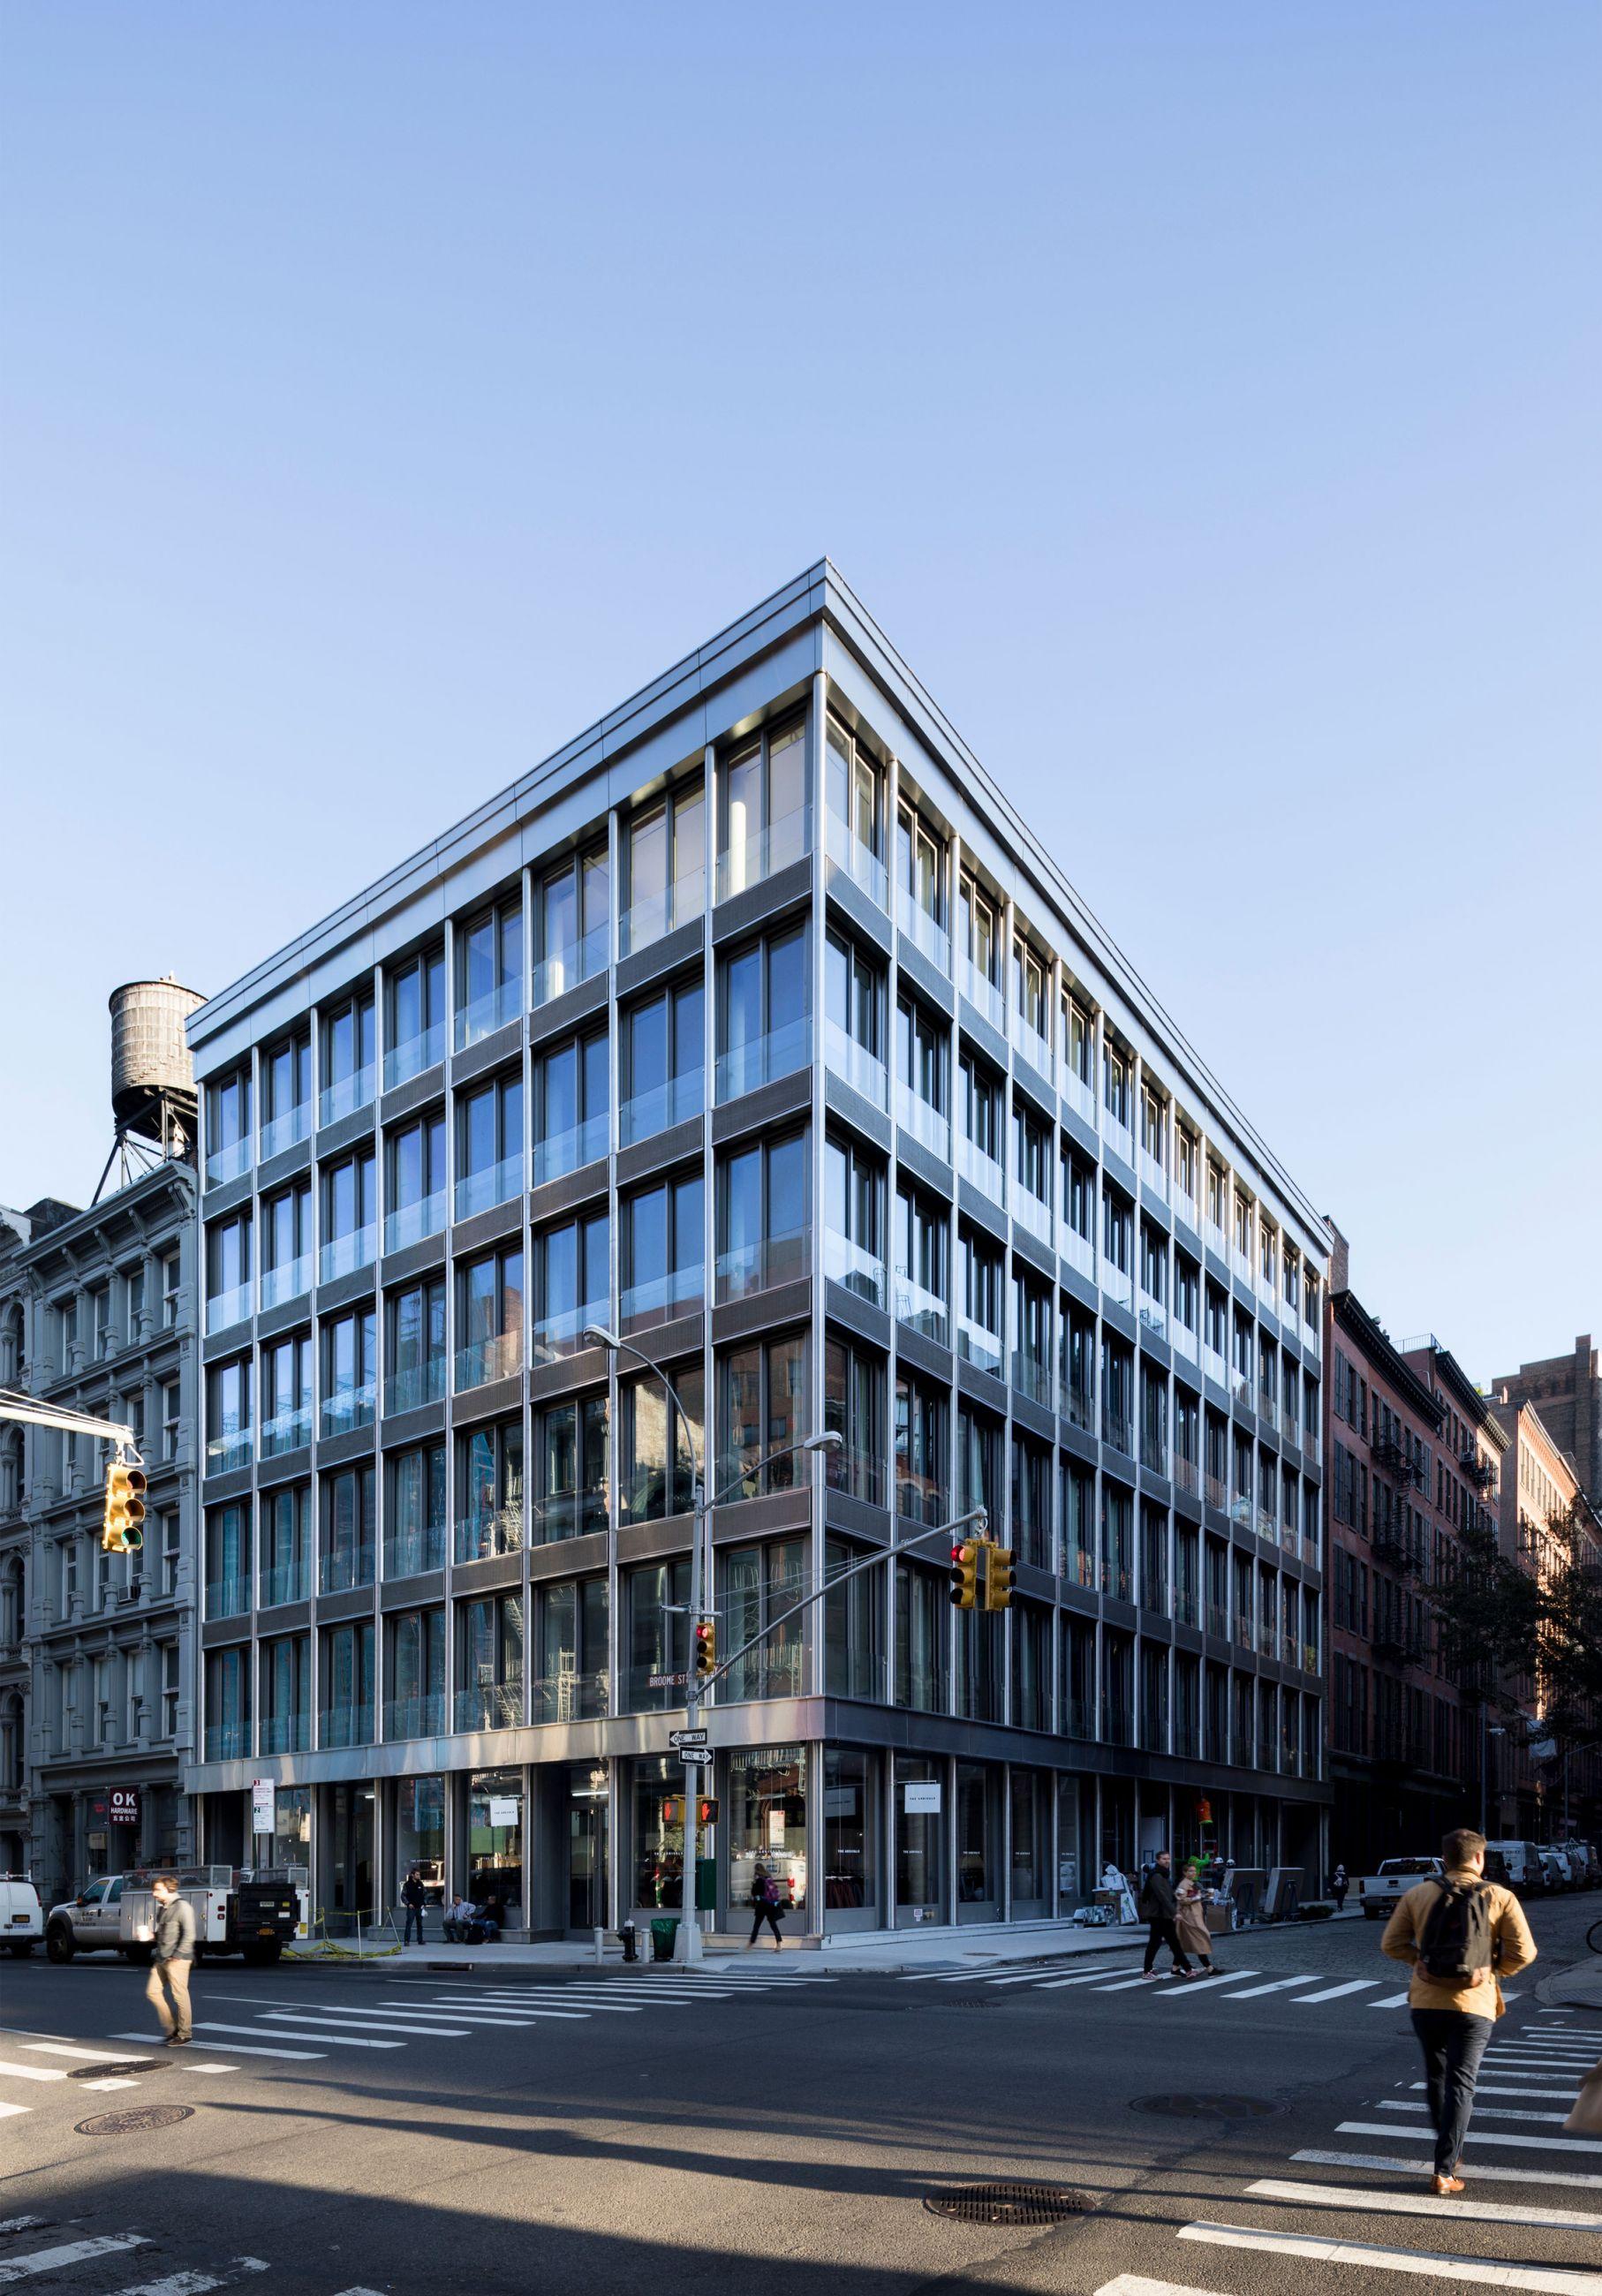 42 Crosby Street - Selldorf Architects - New York